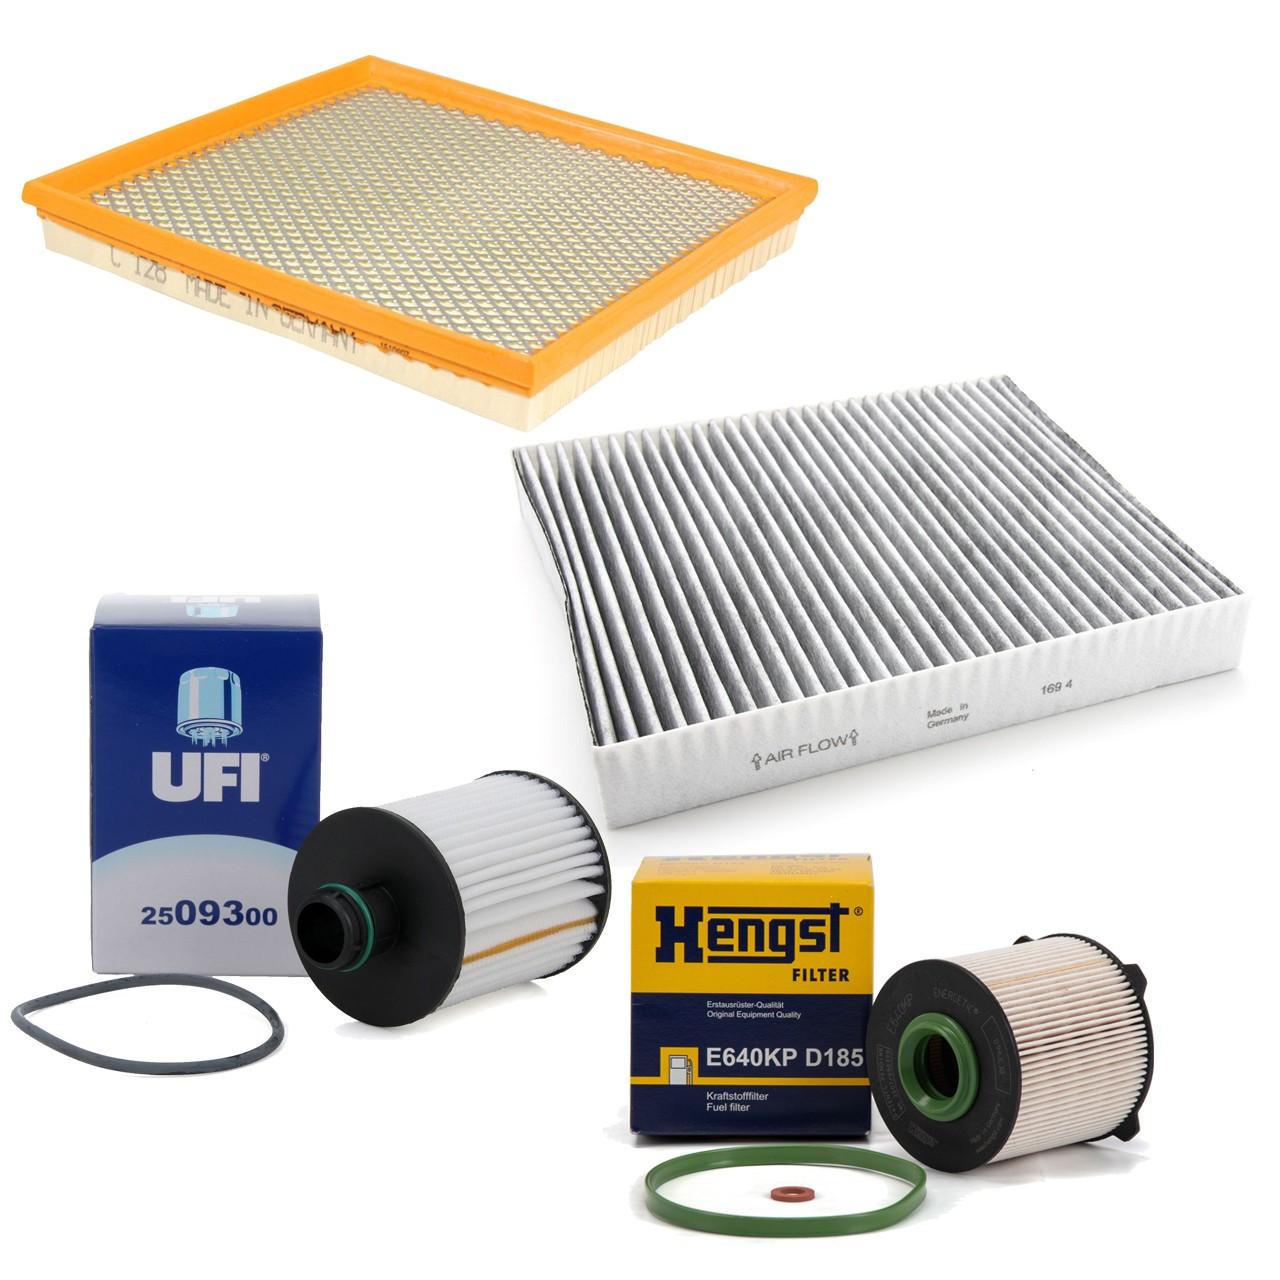 Inspektionskit Filterpaket Filterset für Opel Astra J Cascada Zafira C 2.0CDTI